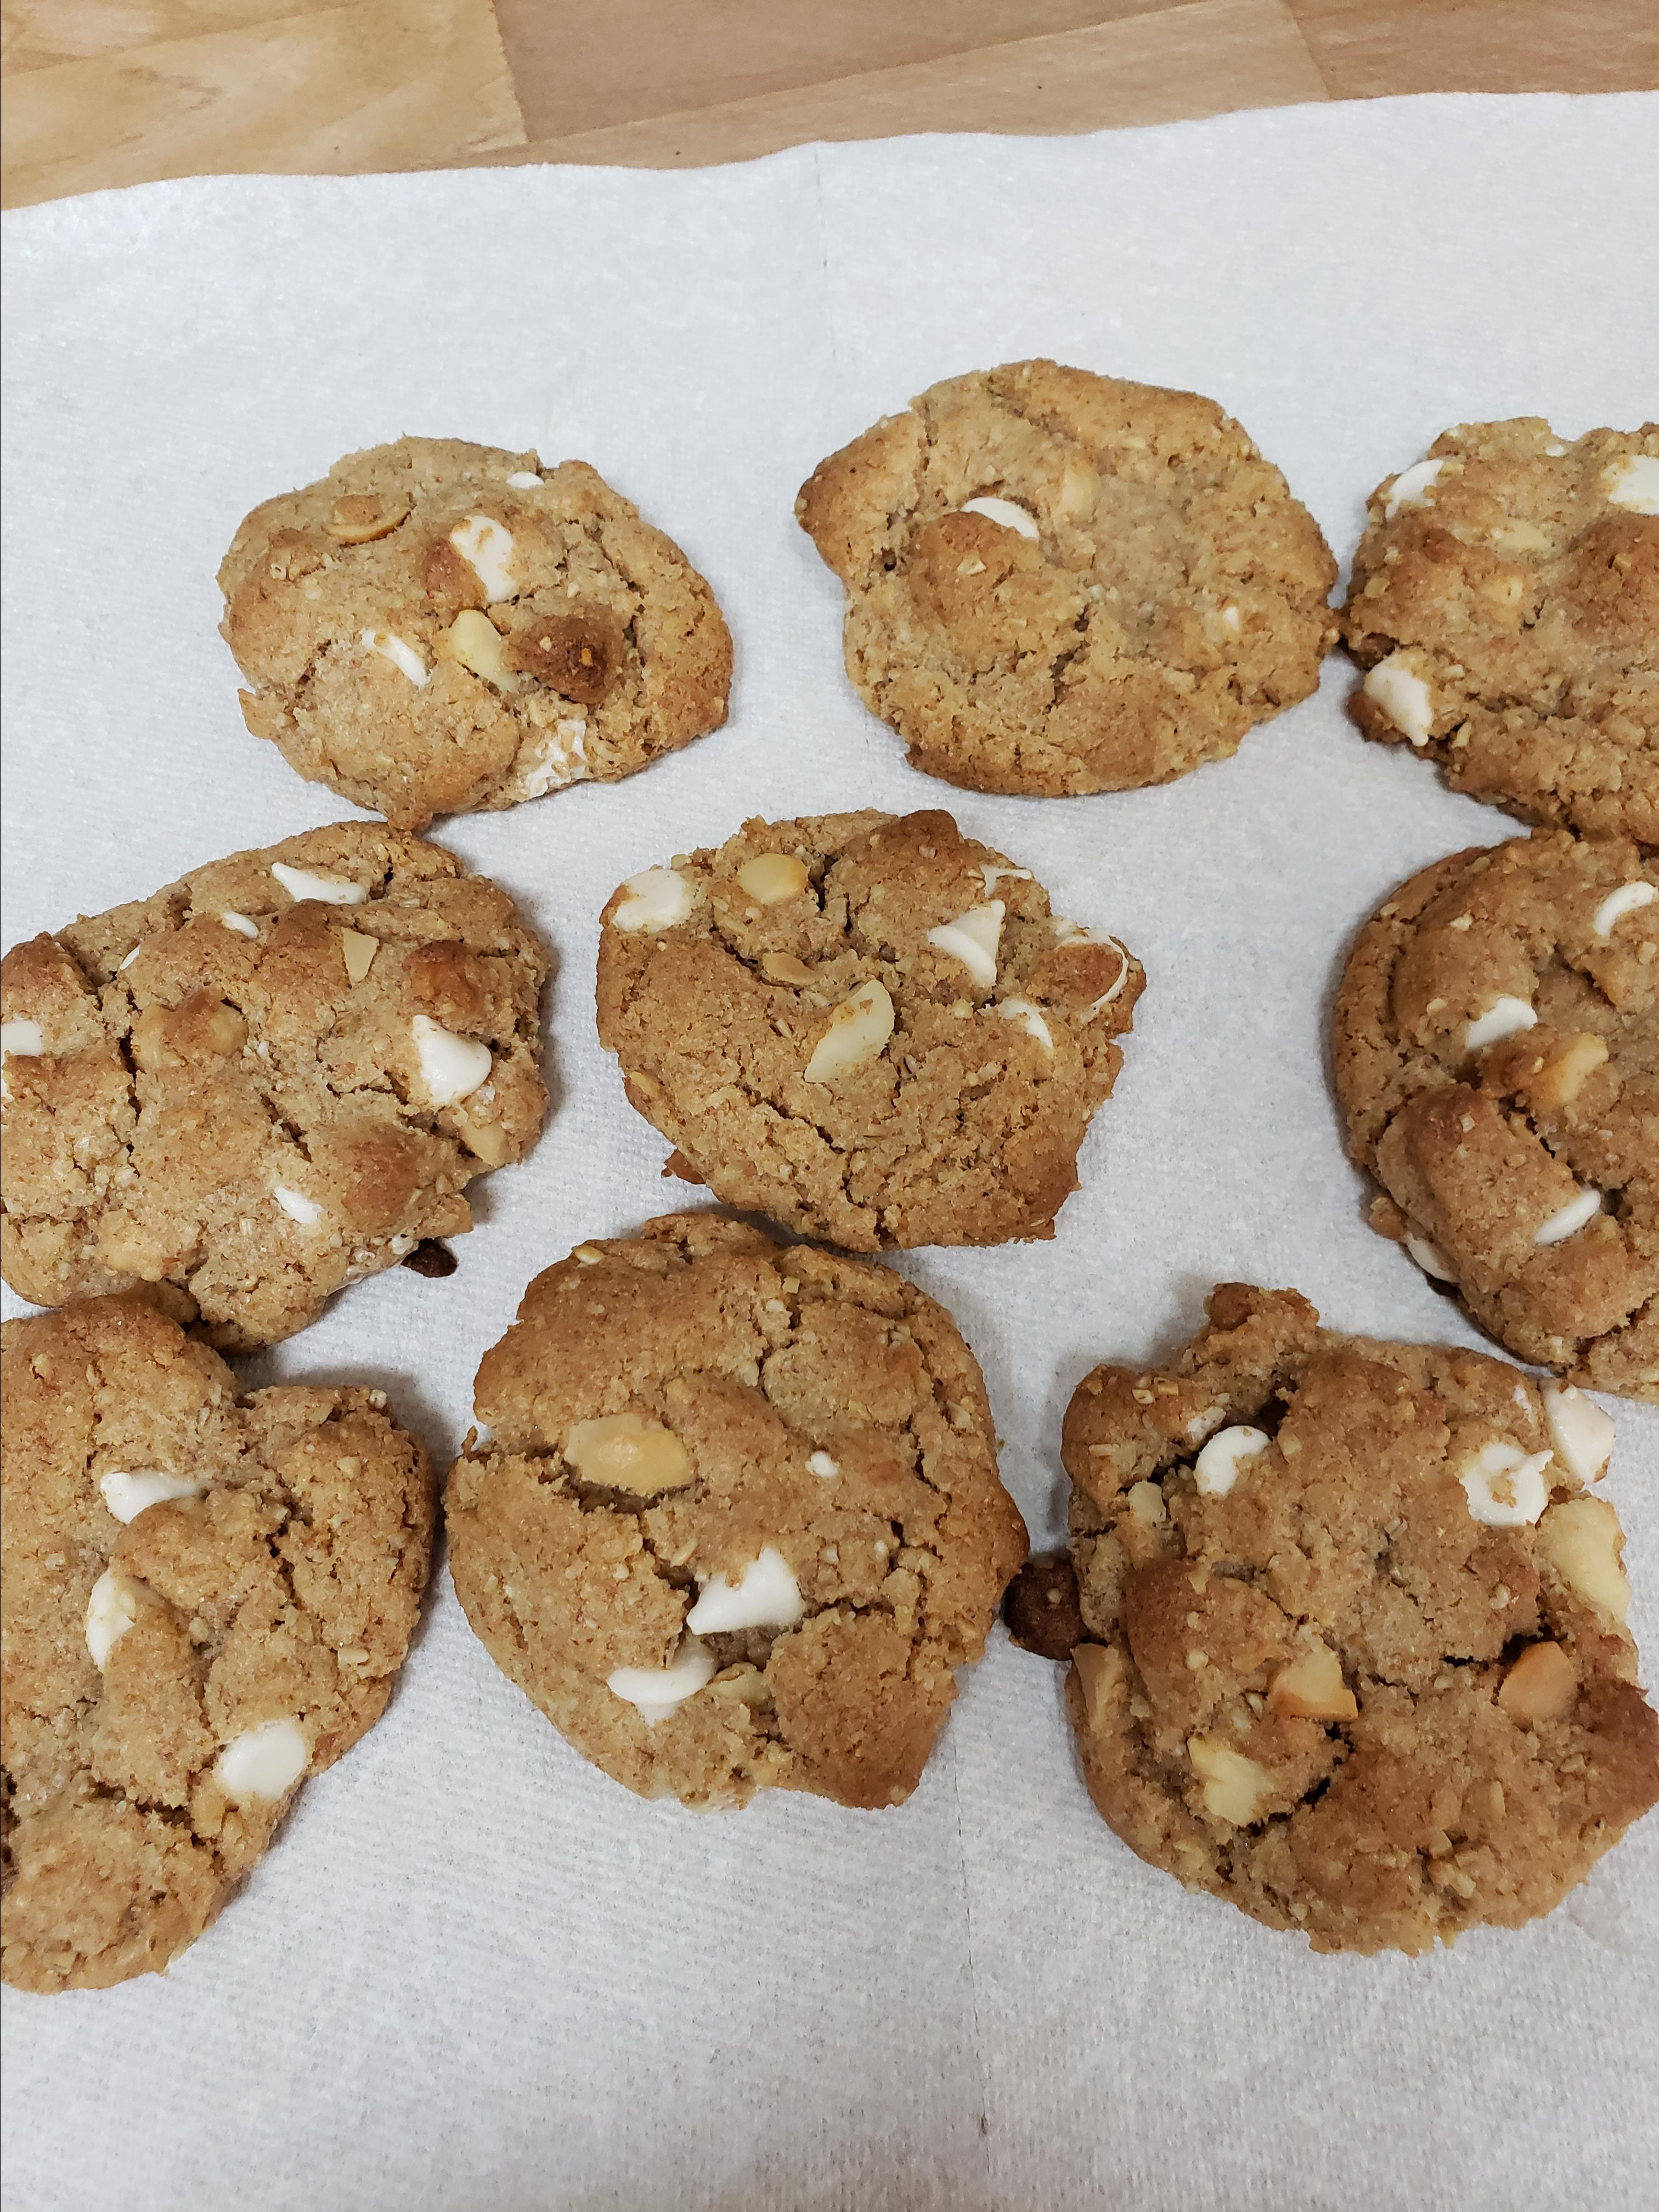 White Chocolate and Macadamia Nut Cookies Jo Nichols